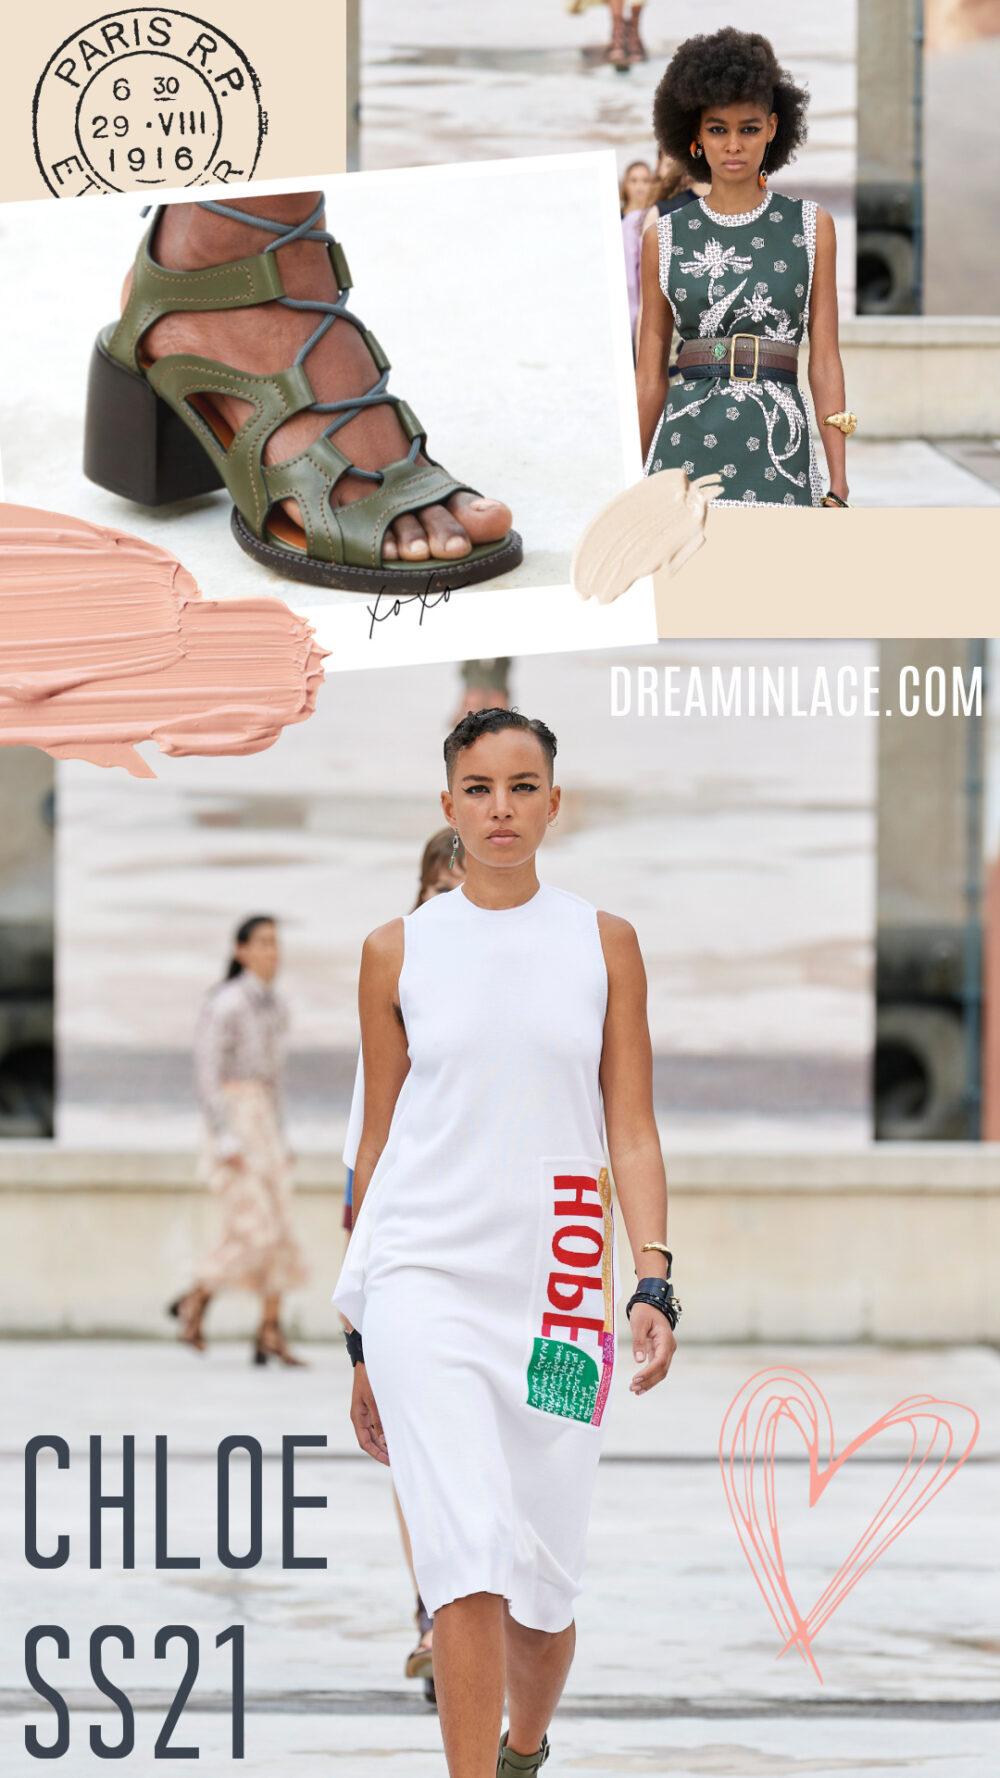 Chloe Spring 2021 Collection Runway at Paris Fashion Week I Dreaminlace.com #ParisFashionWeek #SS21 #Womenswear